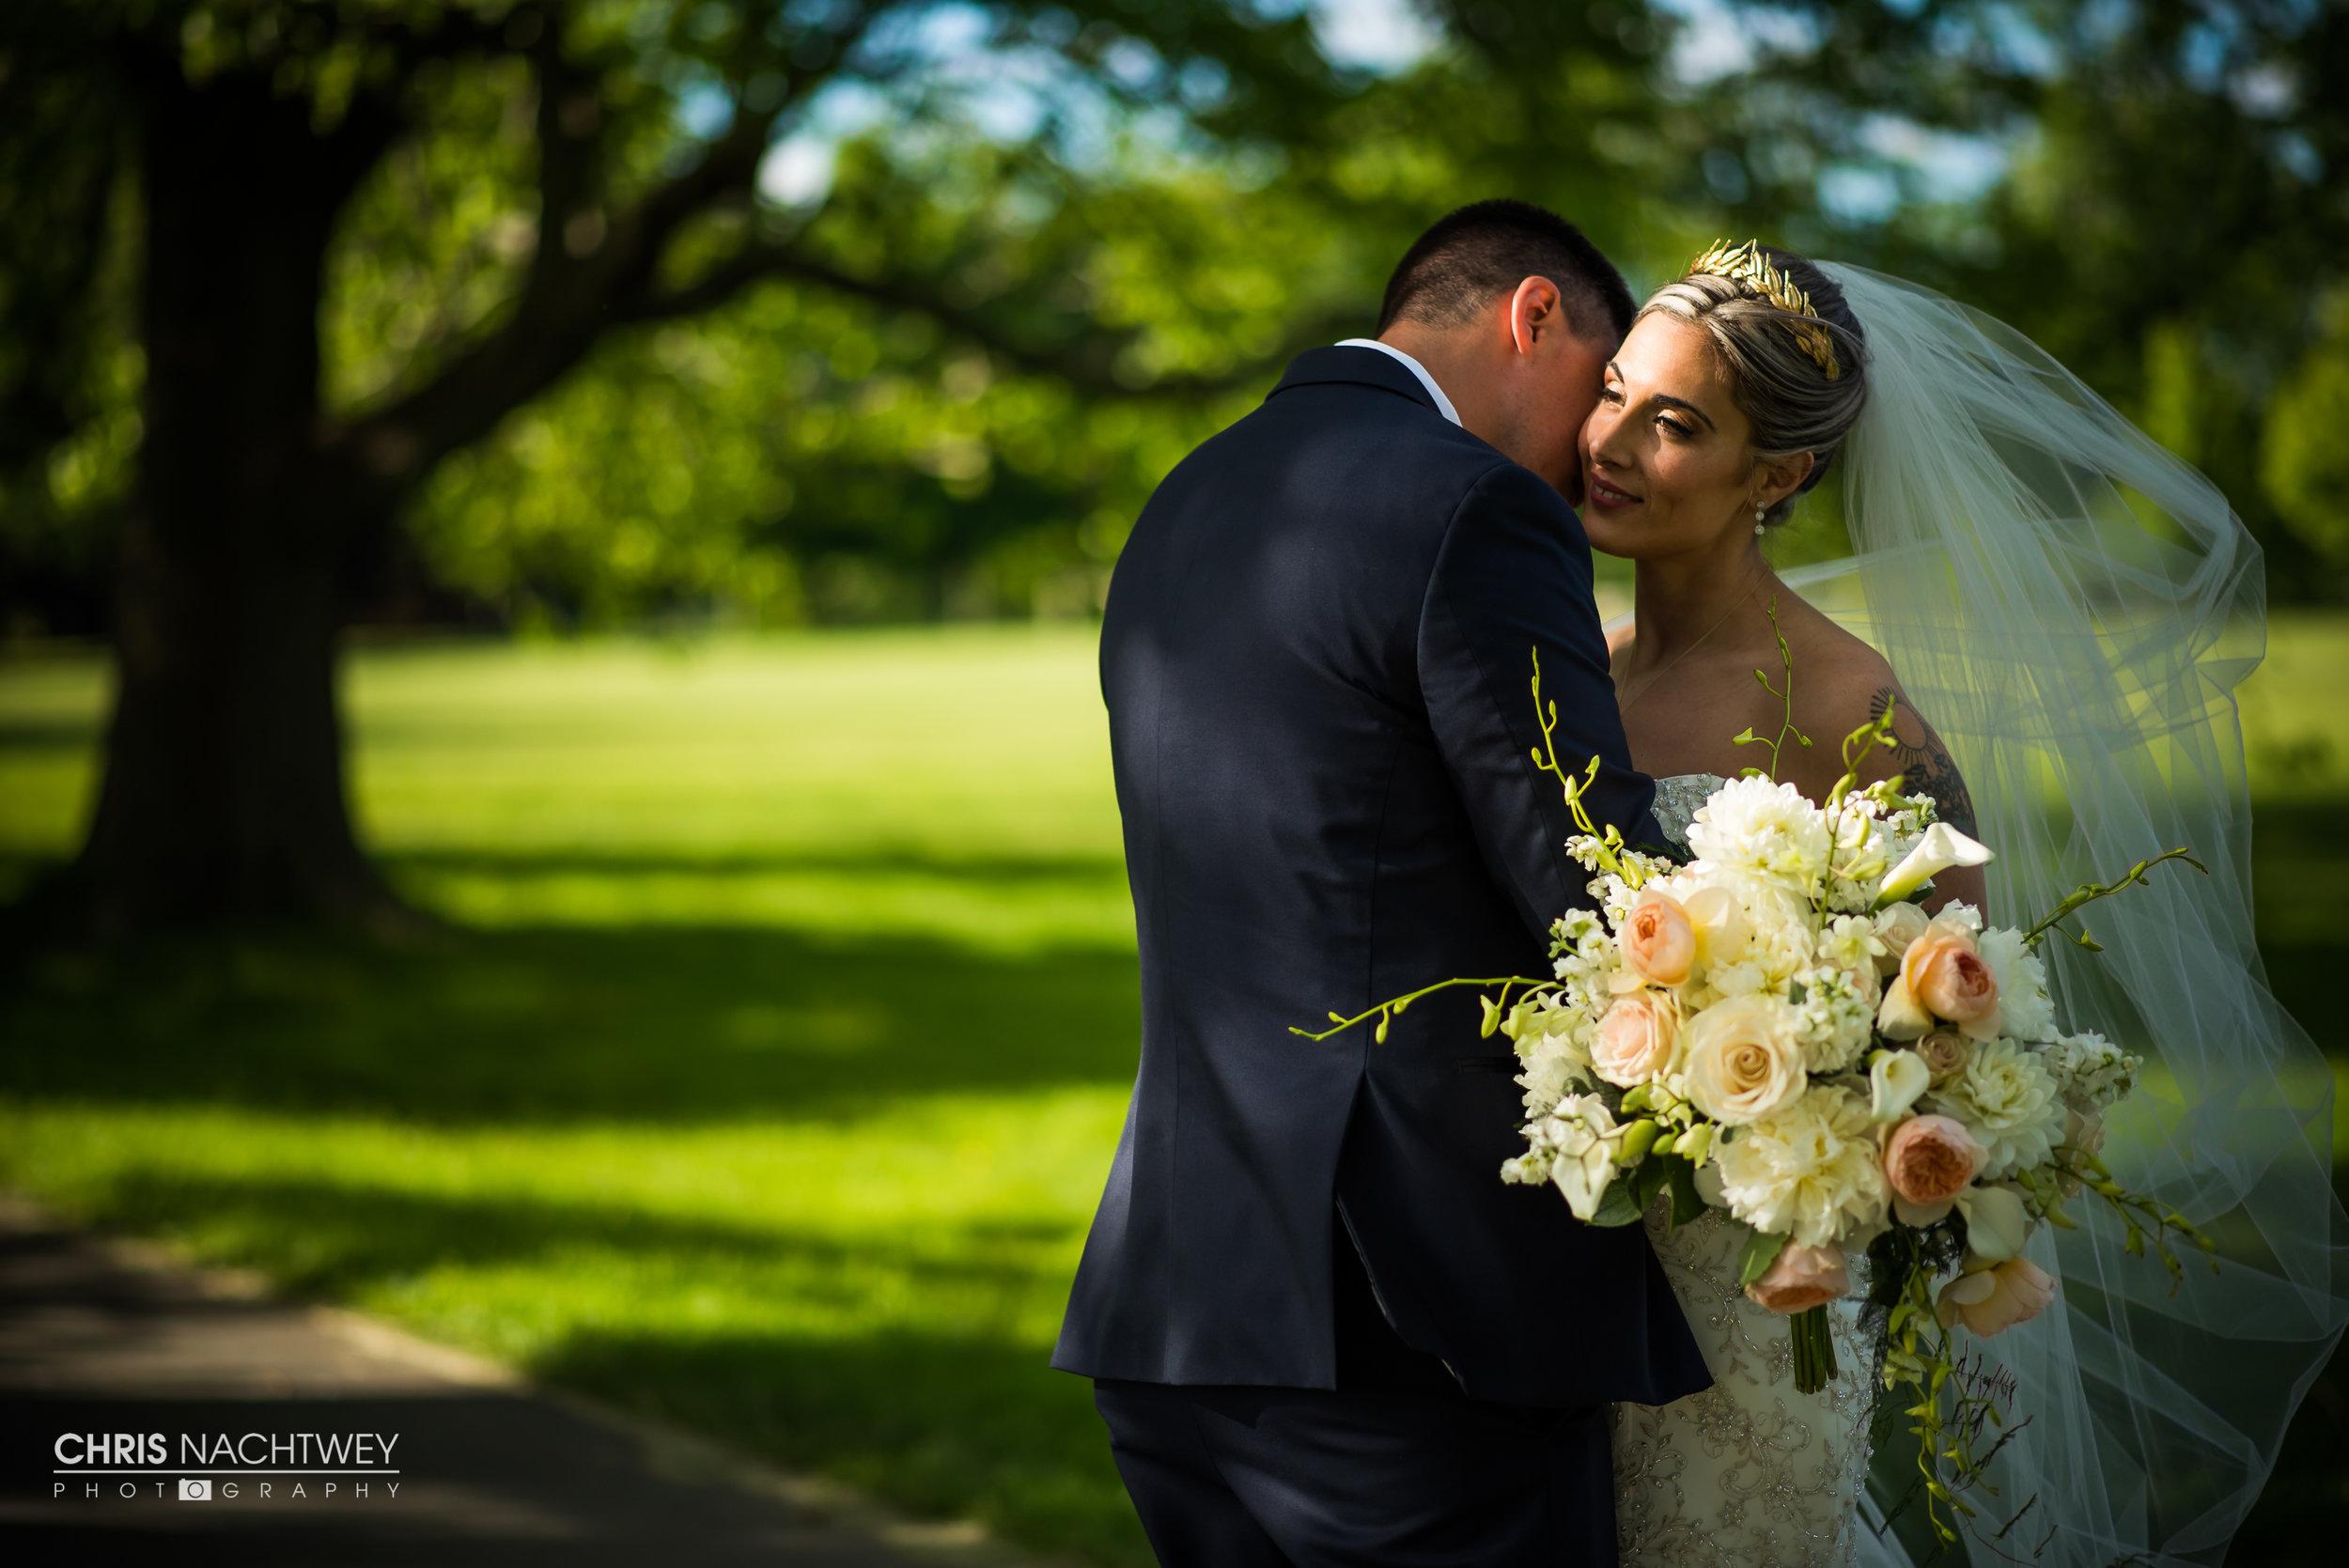 mystic-artistic-wedding-photographer-chris-nachtwey-2017-19.jpg